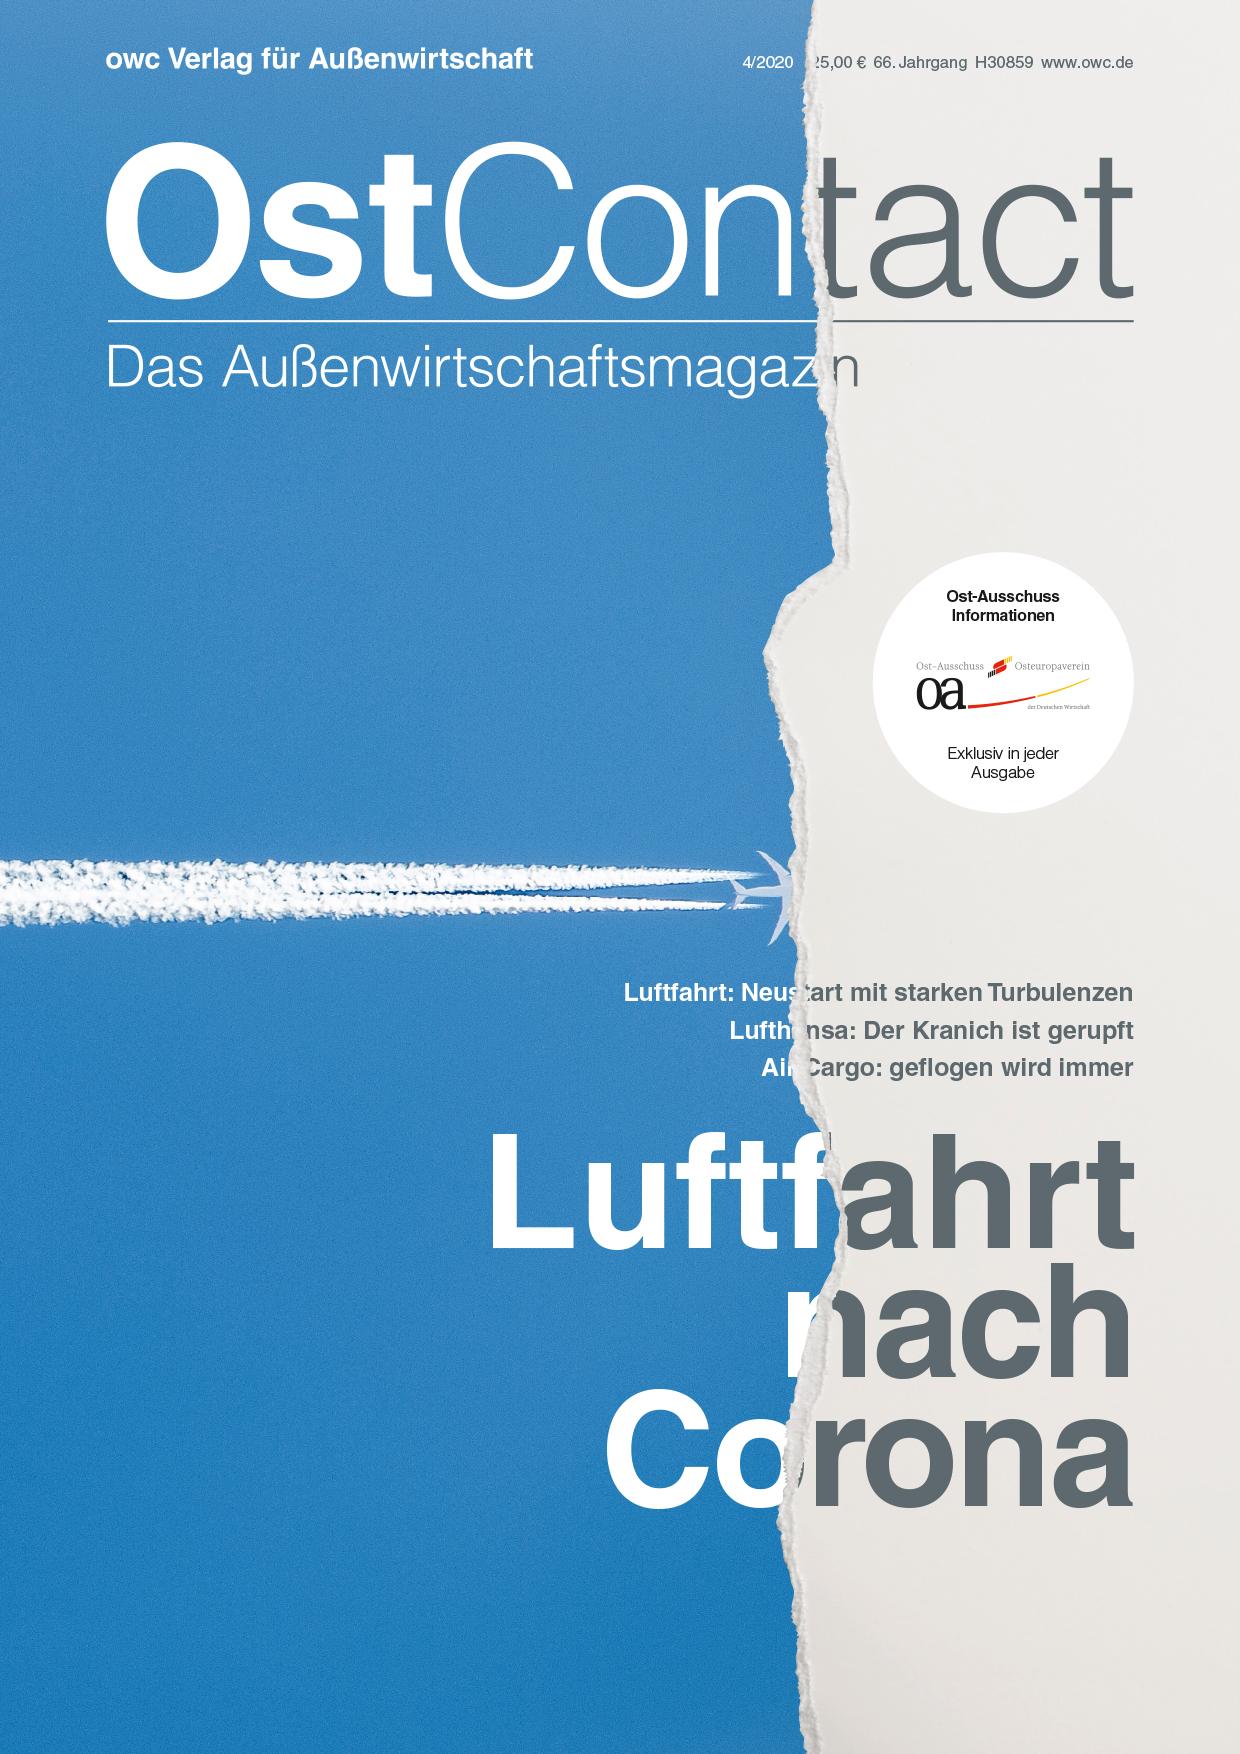 https://owc.de/wp-content/uploads/2020/07/OC_4-2020_cover.jpg